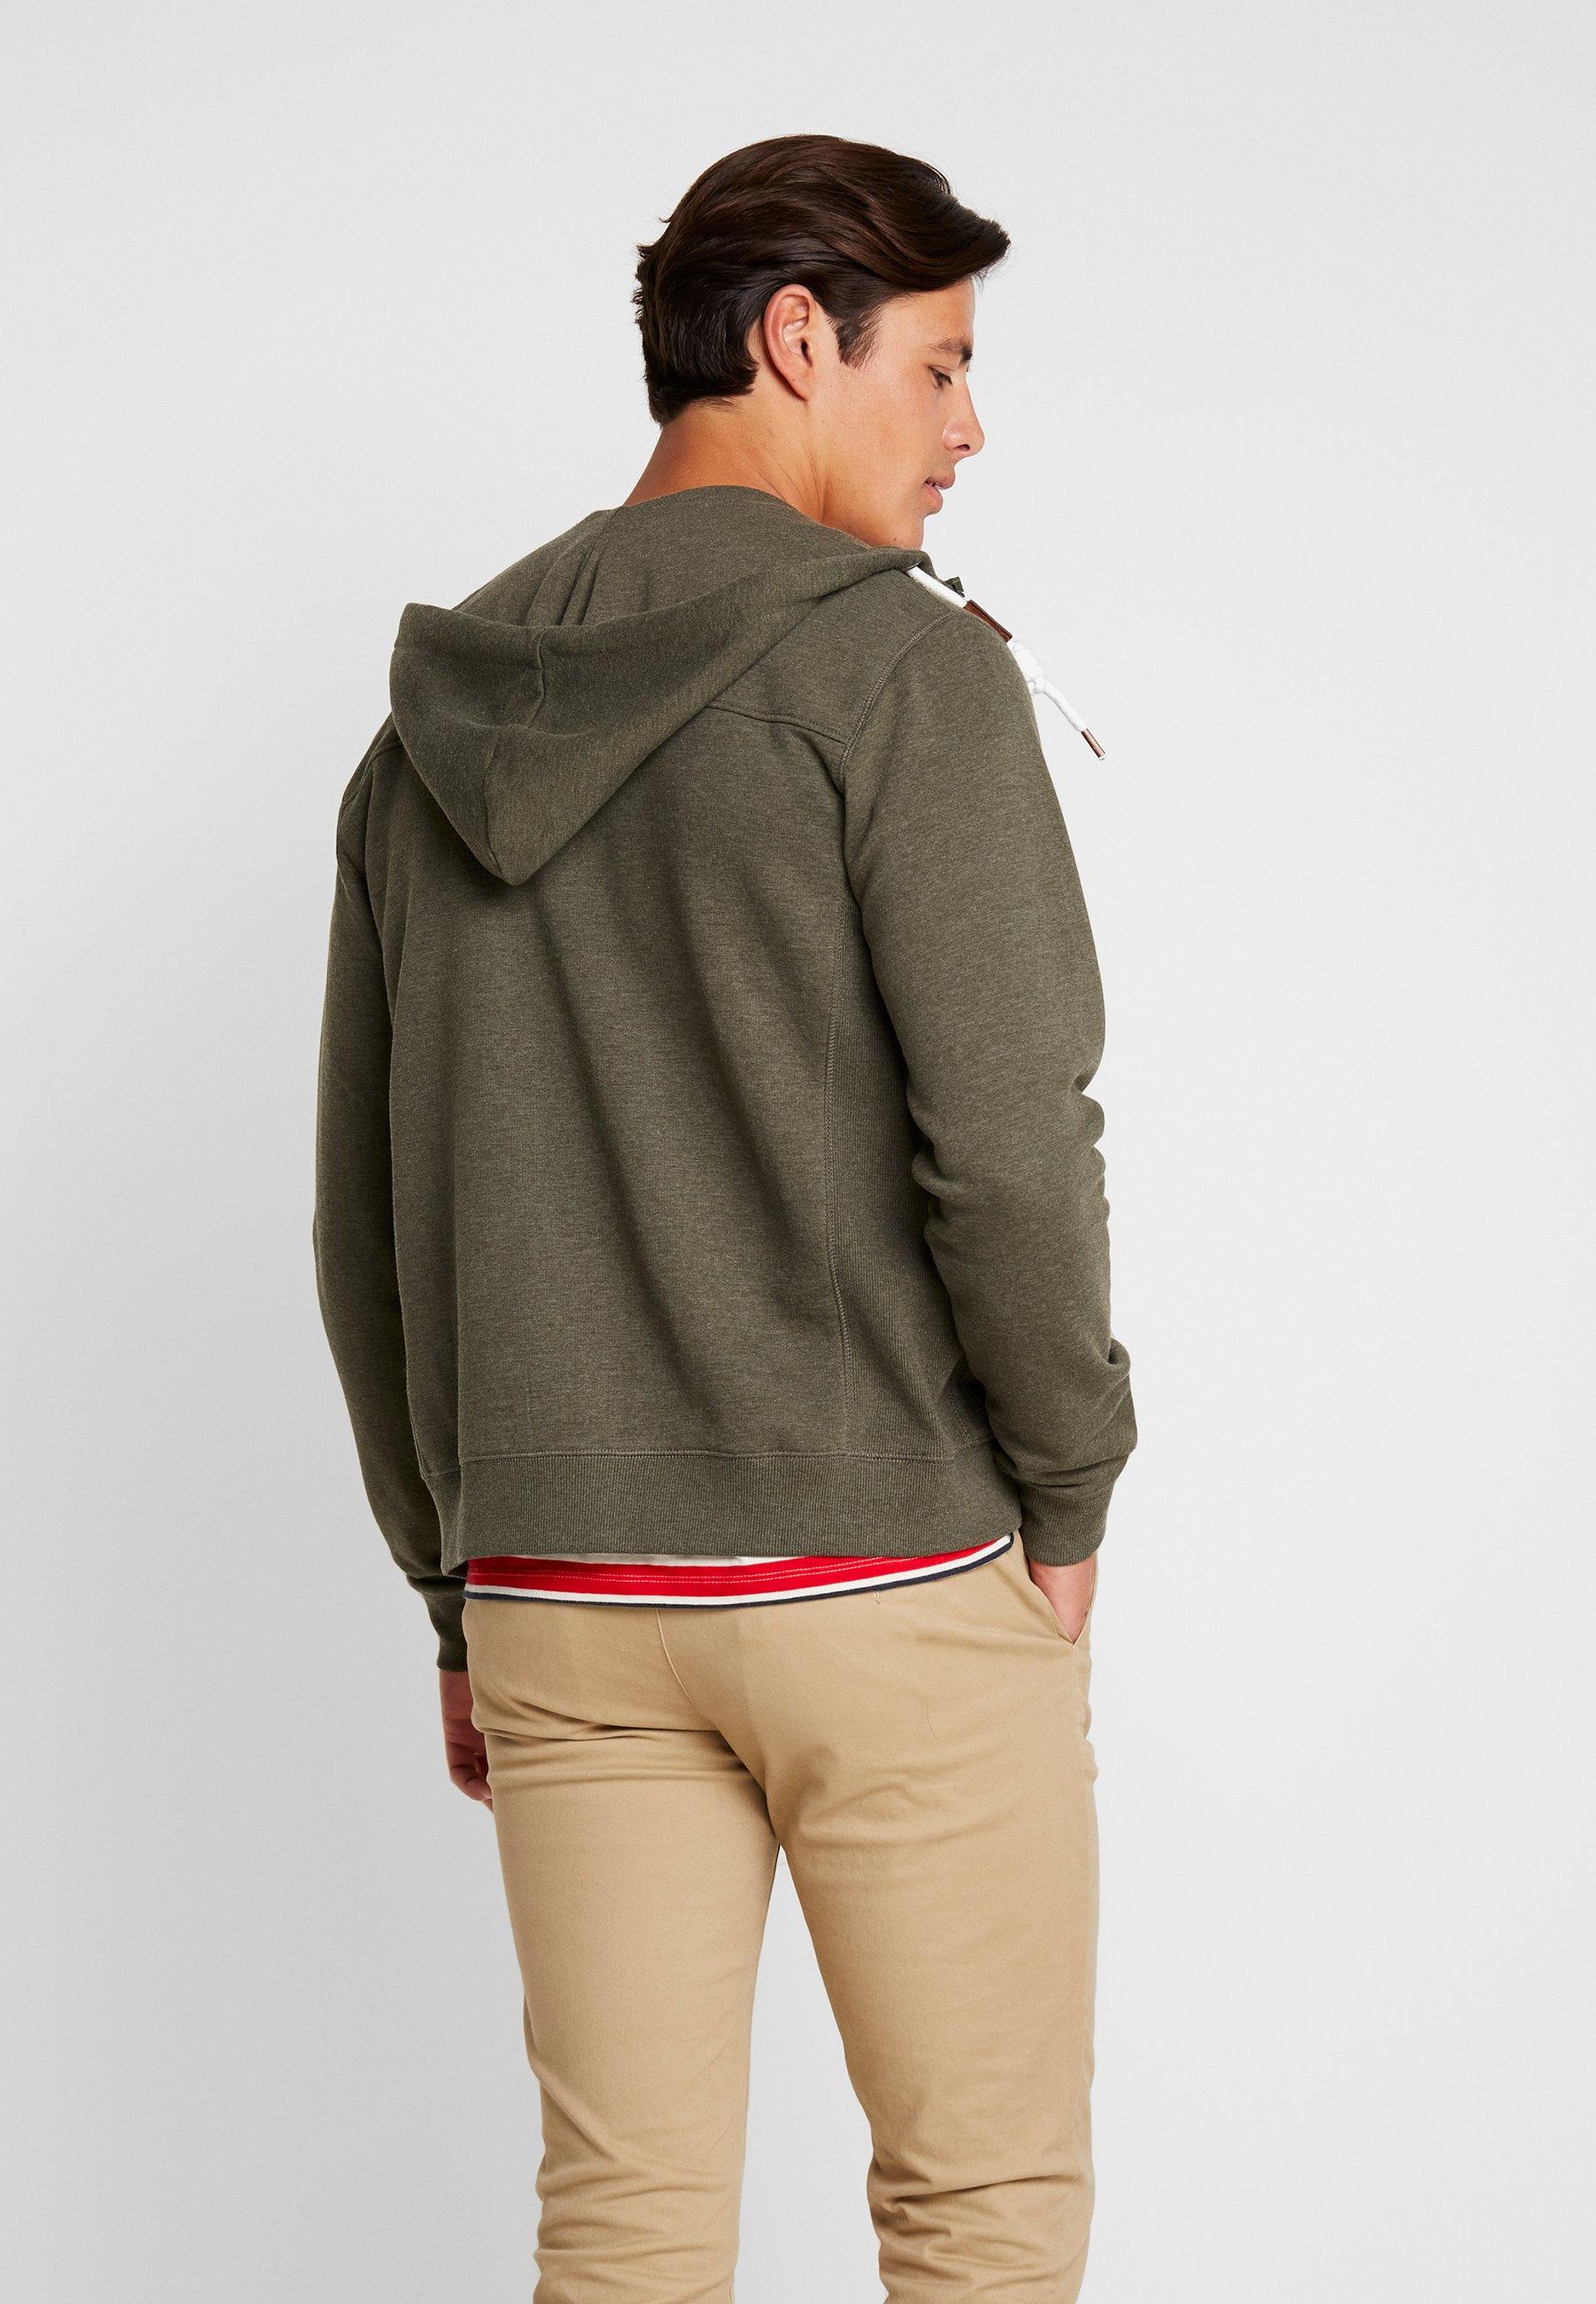 Jeans En Sweat Zippée QuinbyVeste Indicode Army Mix lK1JFcT